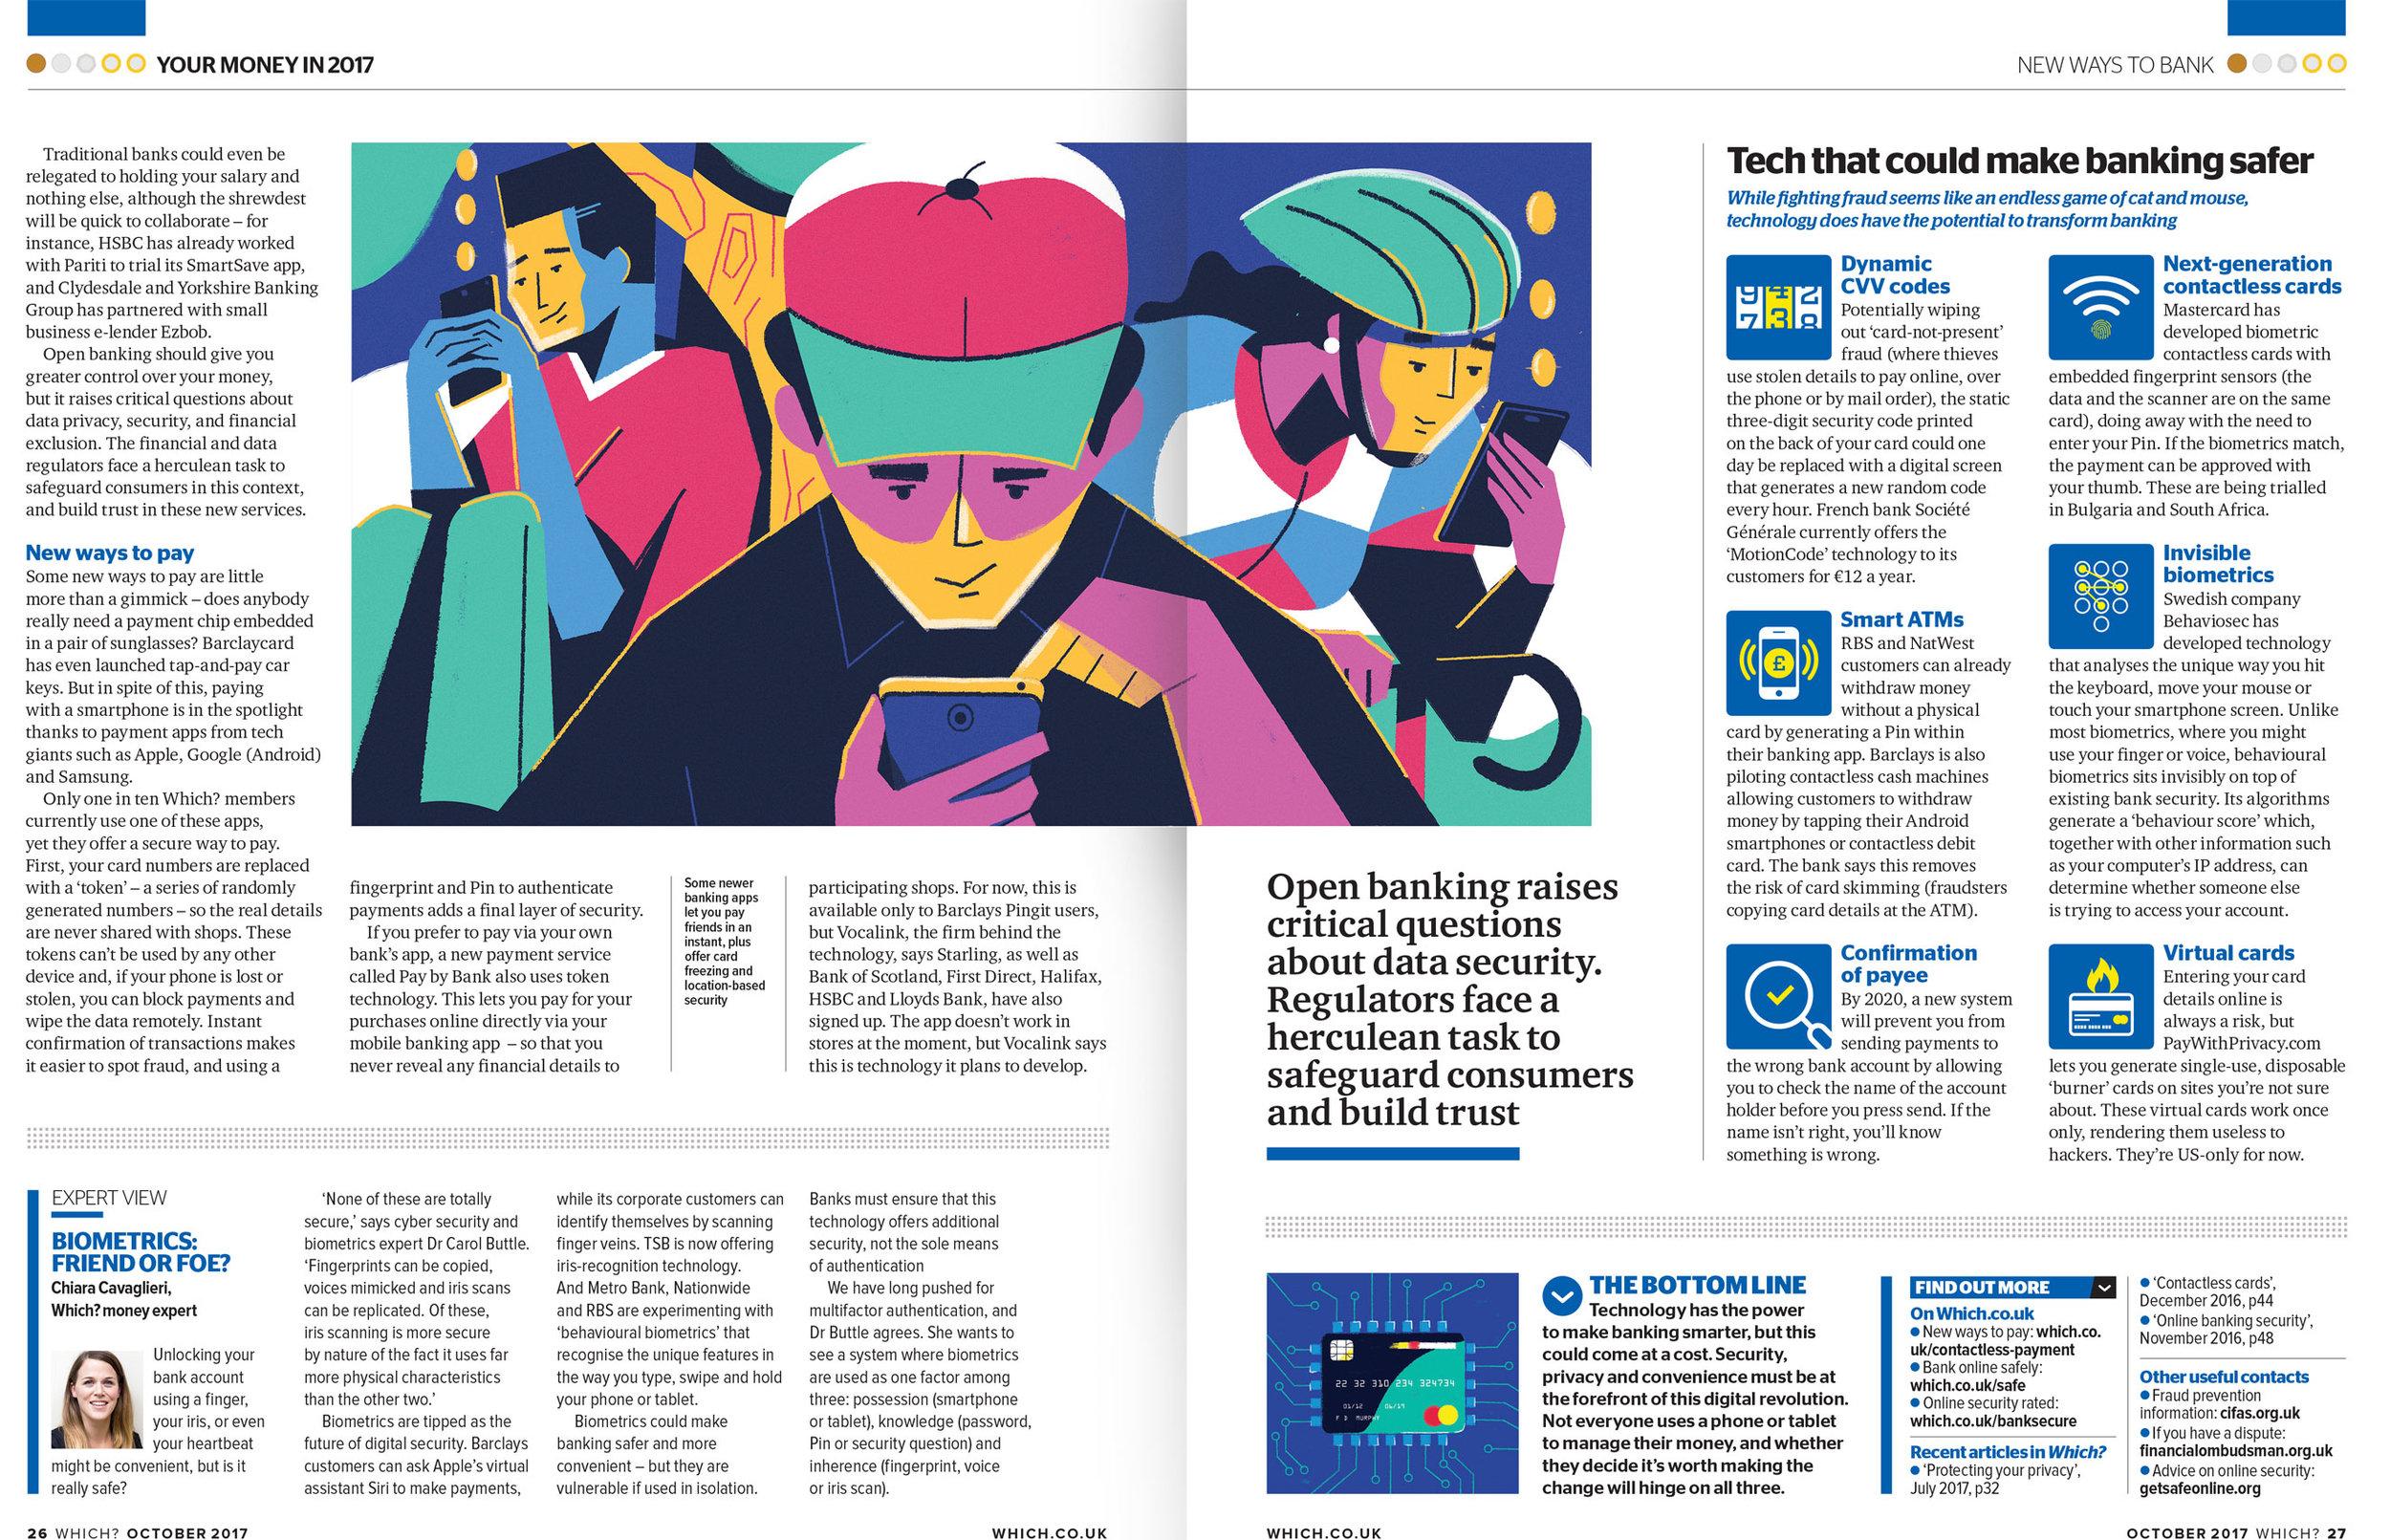 dale edwin murray freelance illustrator which? magazine editorial illustration